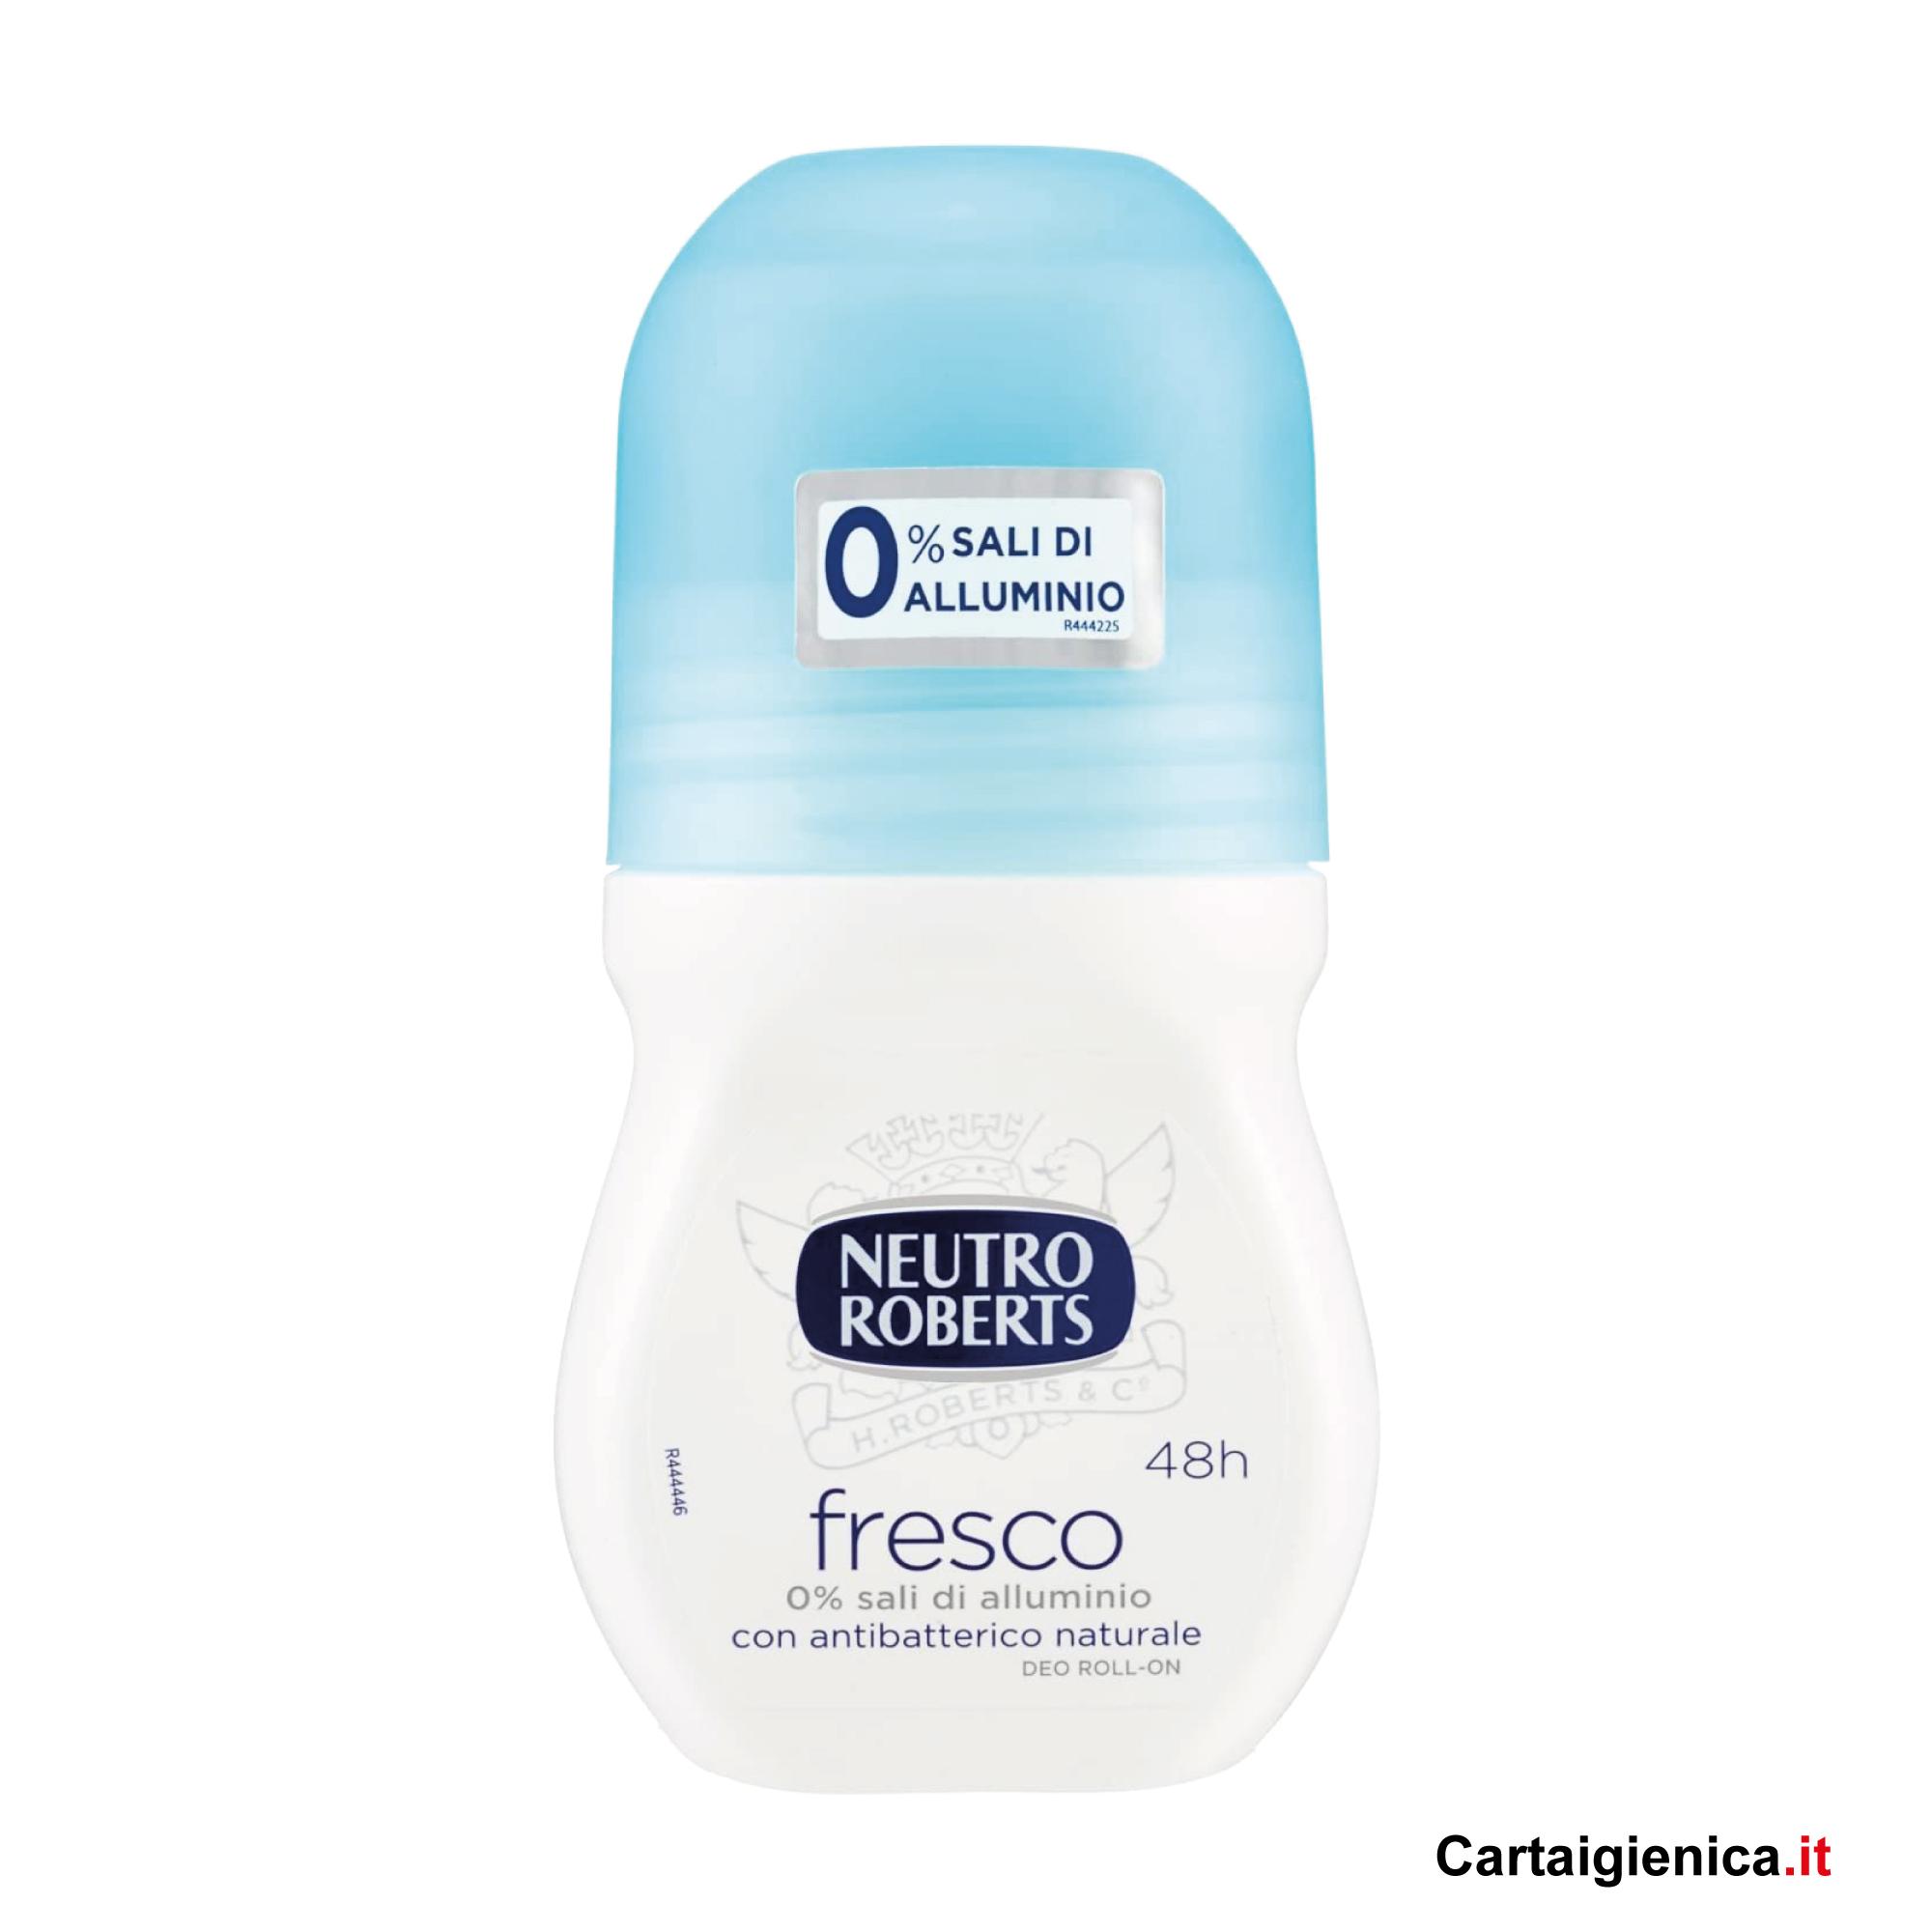 Neutro Roberts Deodorante Roll-On Fresco Azzurro Classico 50 ml